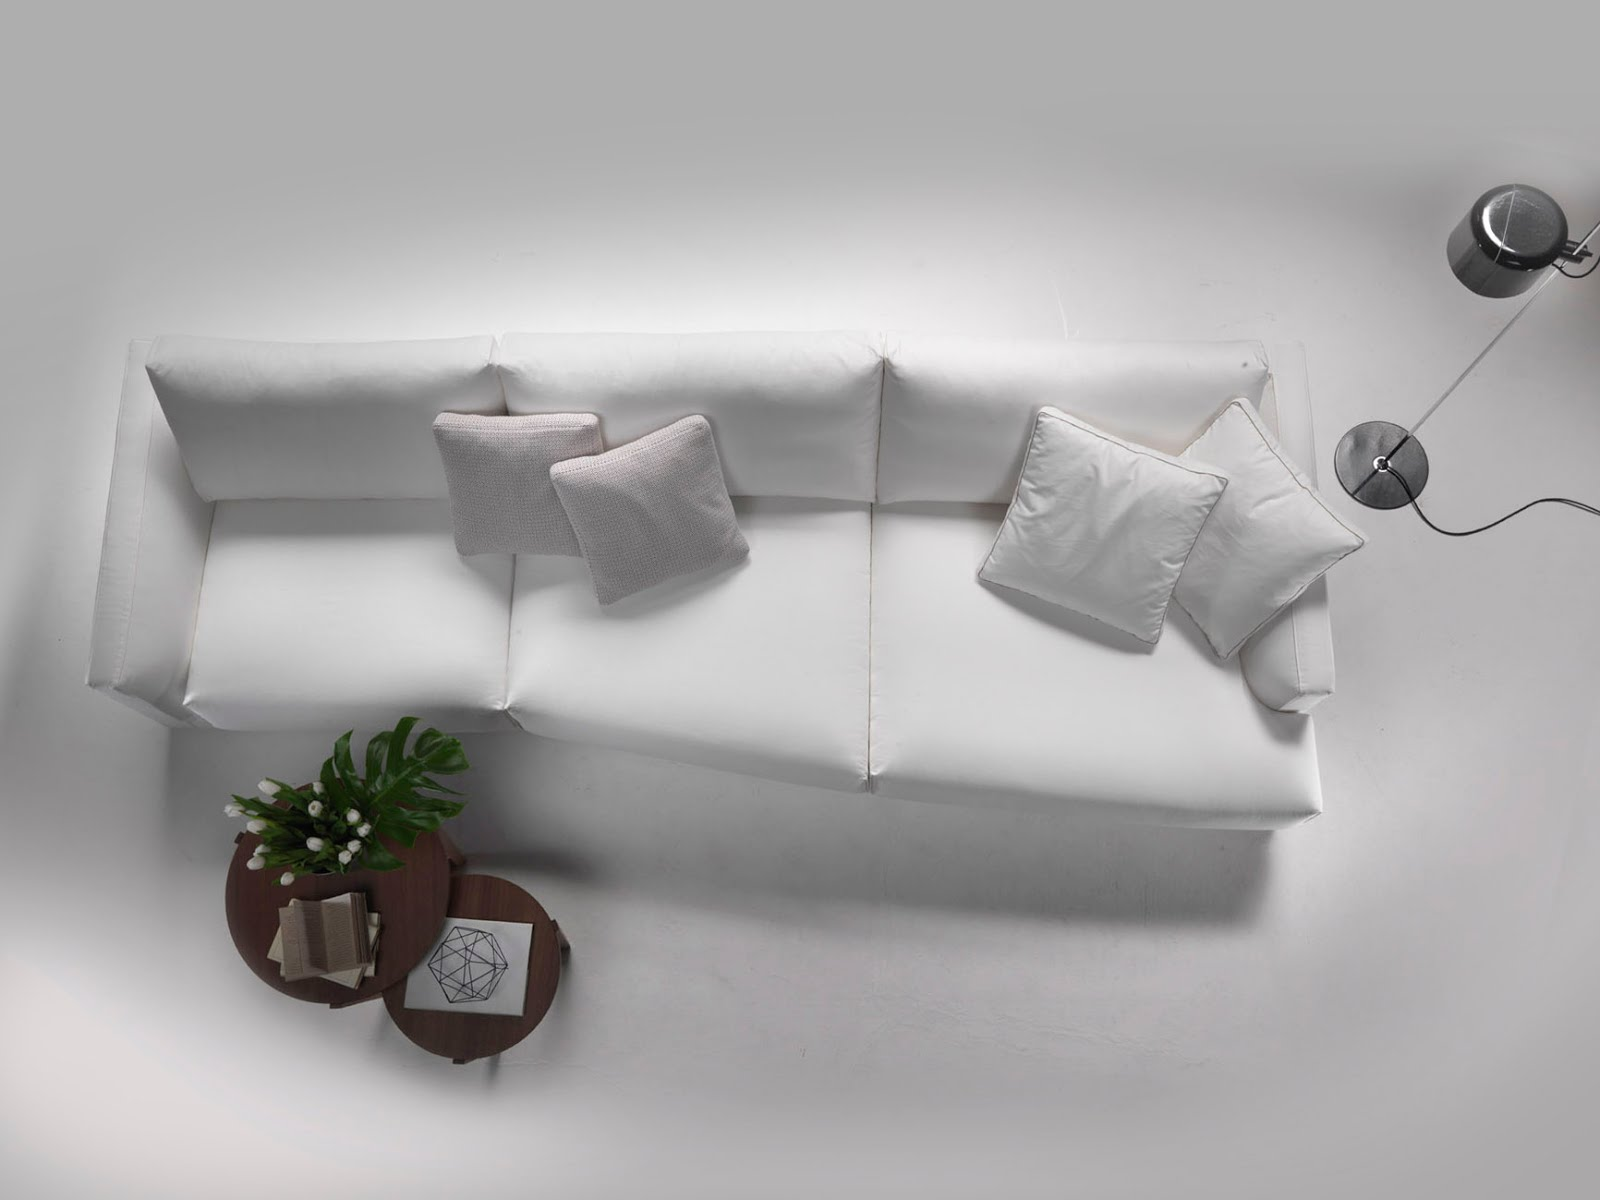 Fabbrica divani su misura milano tino mariani